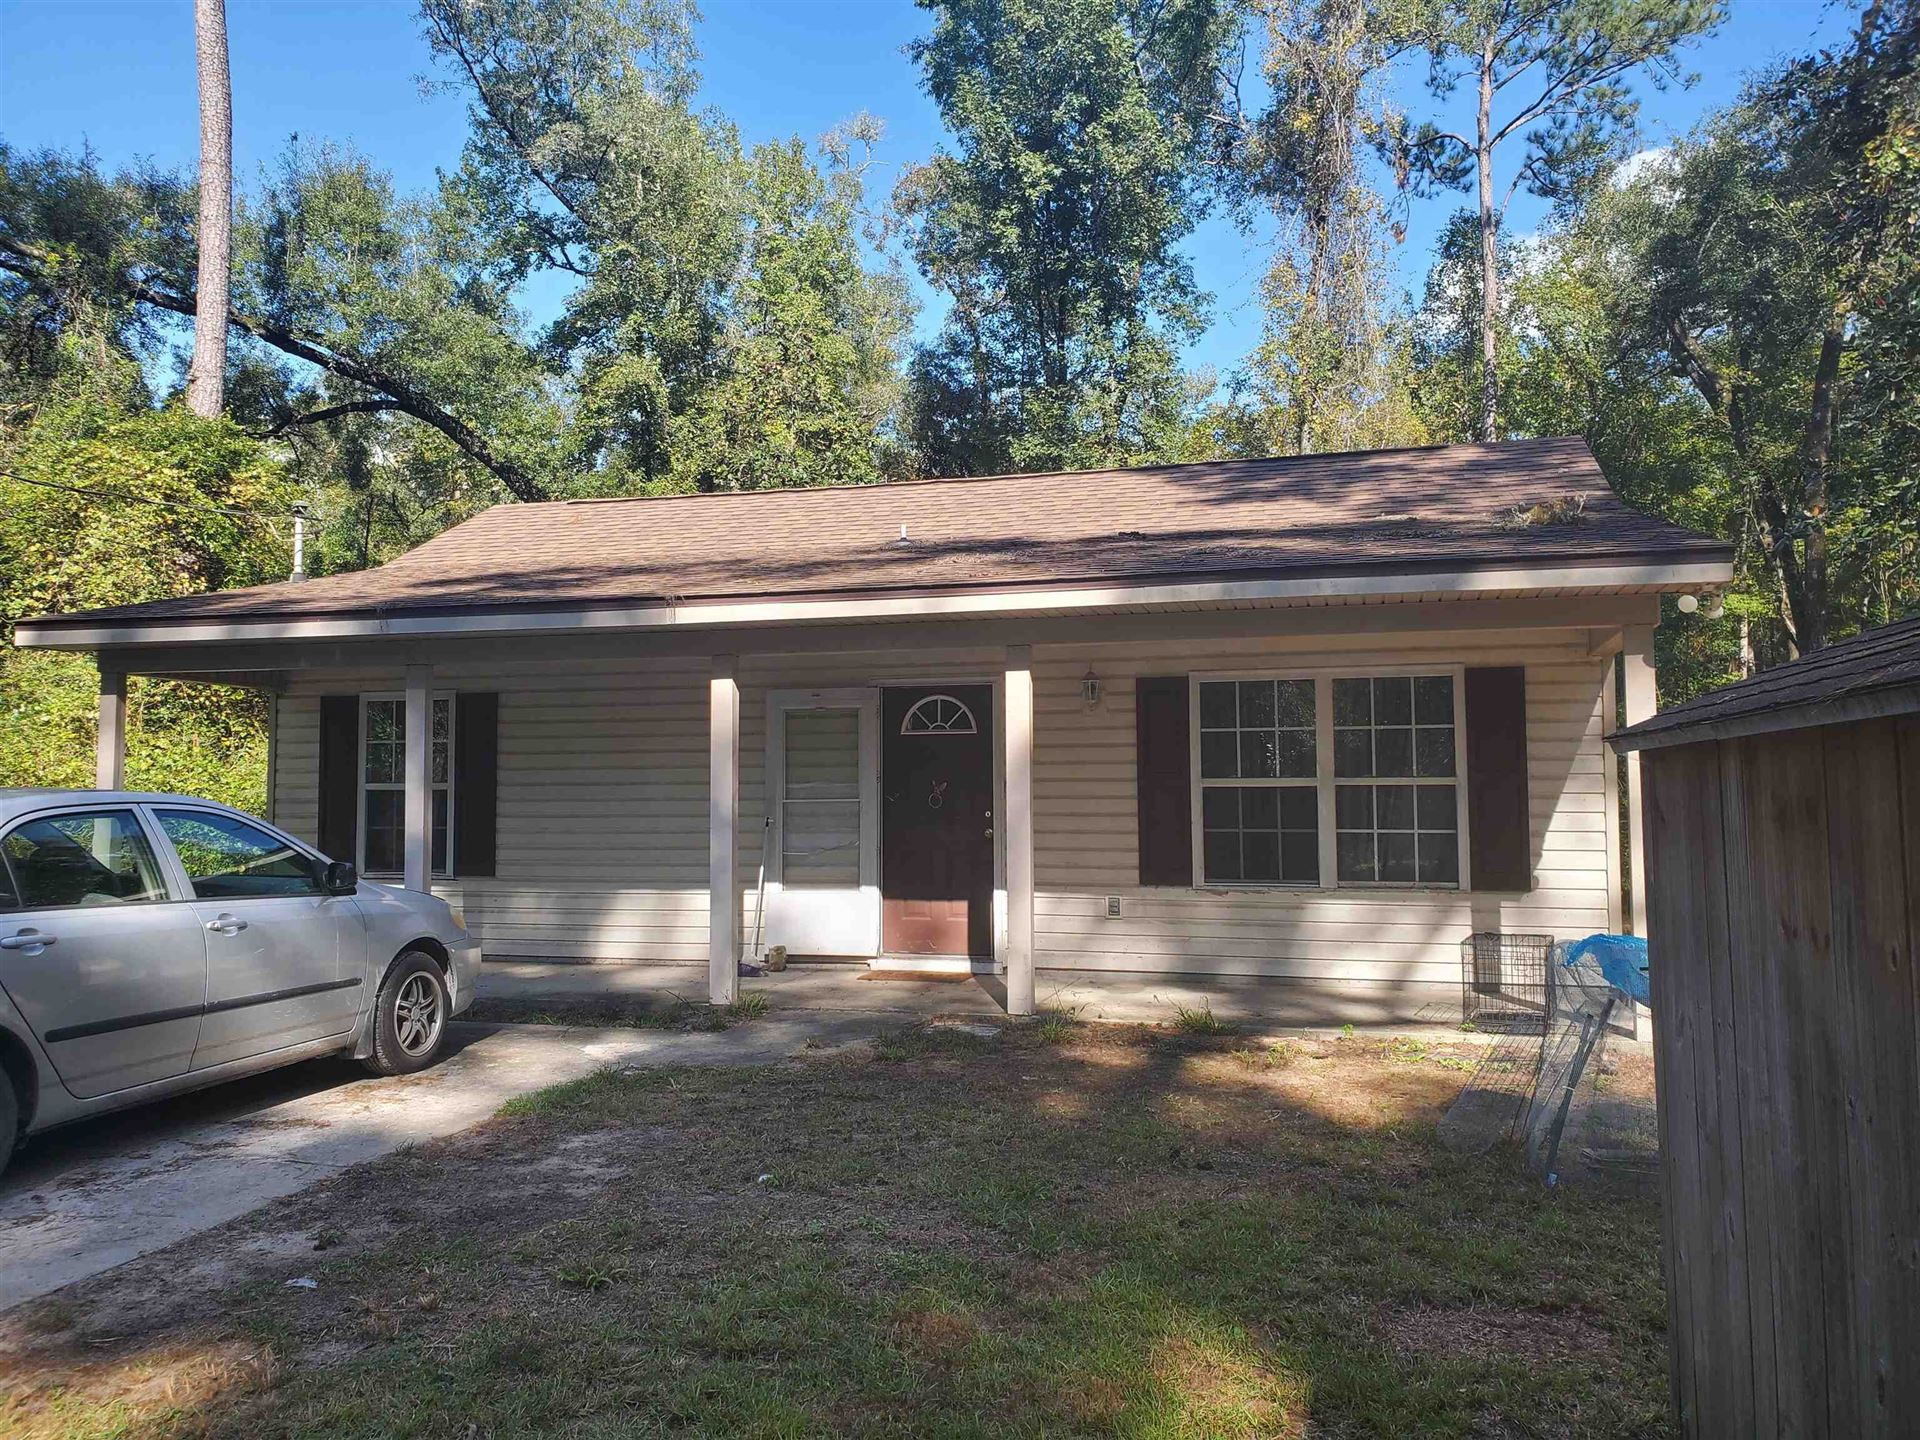 181 Renegade Road, Crawfordville, FL 32327 - MLS#: 338350